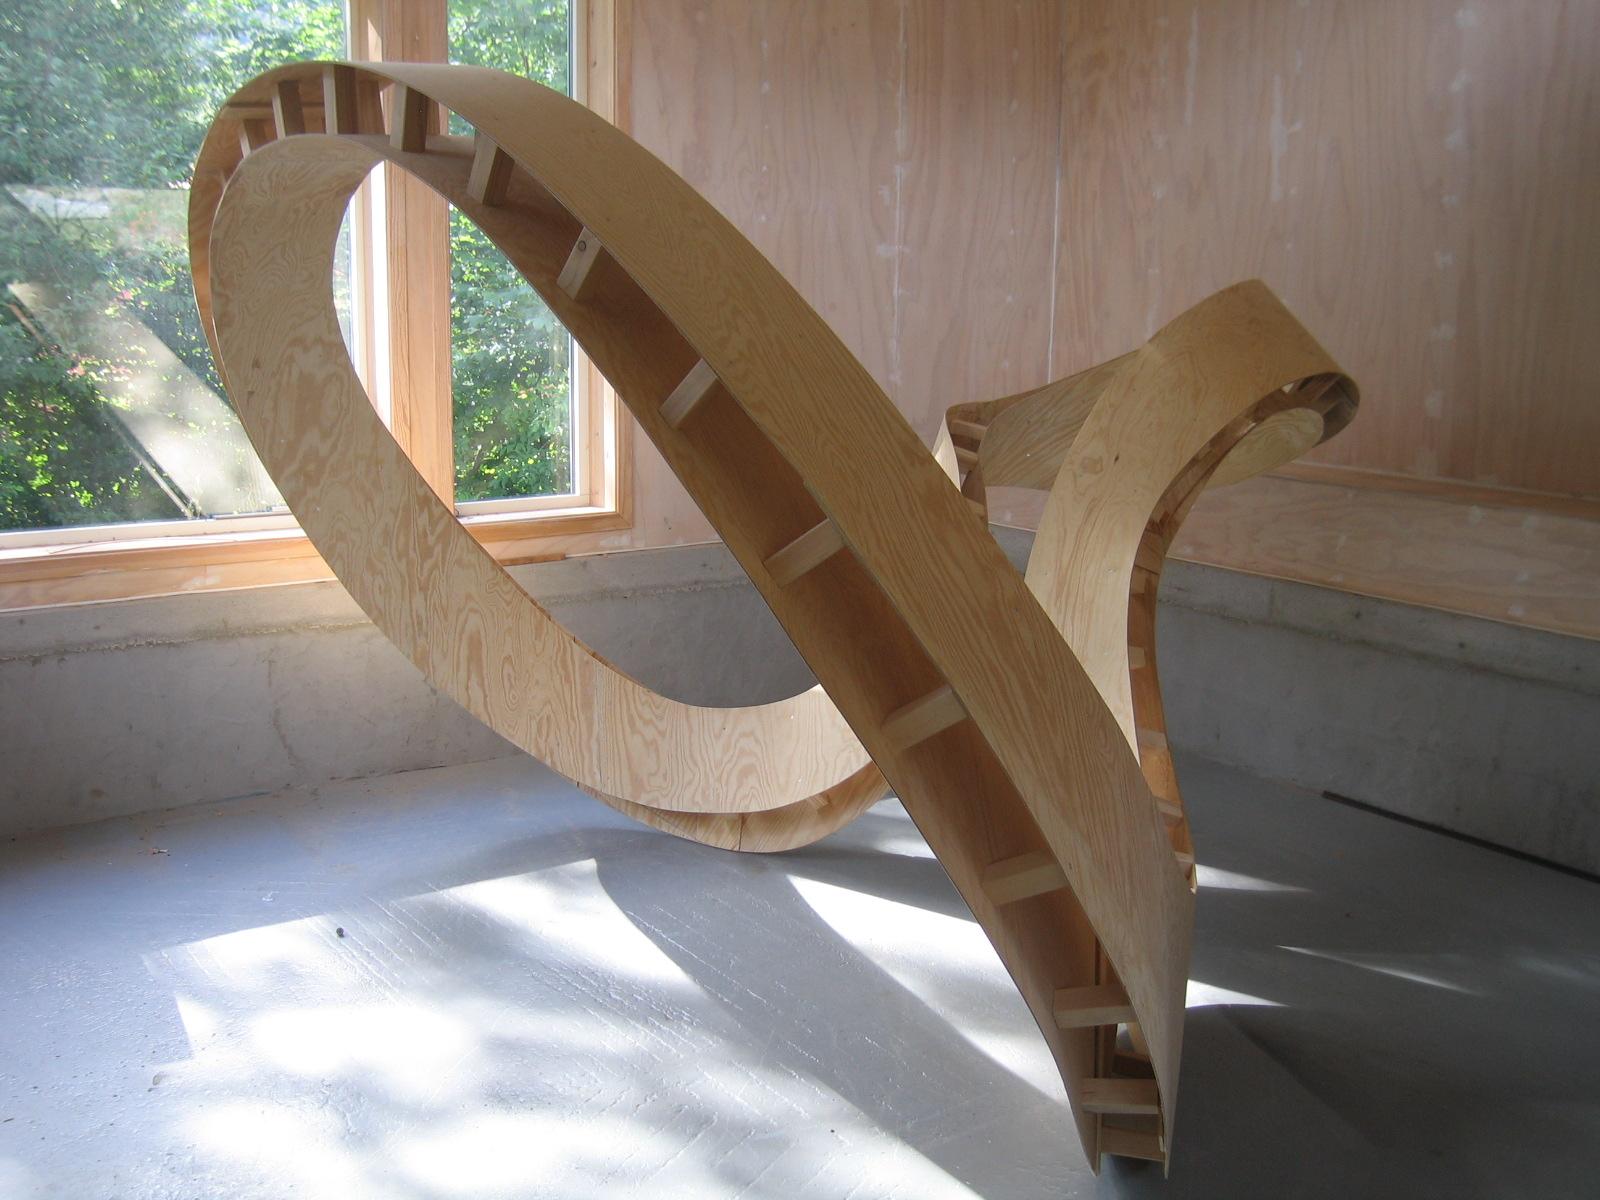 skulptur holz tre wood reinhard haverkamp. Black Bedroom Furniture Sets. Home Design Ideas